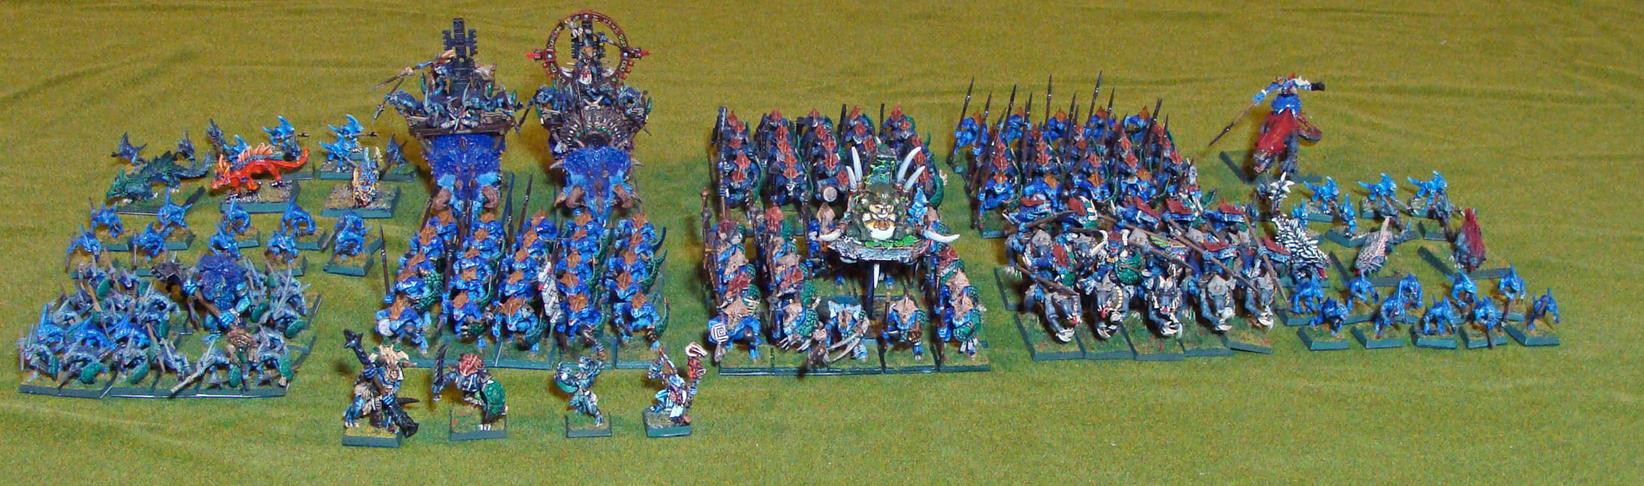 Lizardman Army By Kirasu On Deviantart